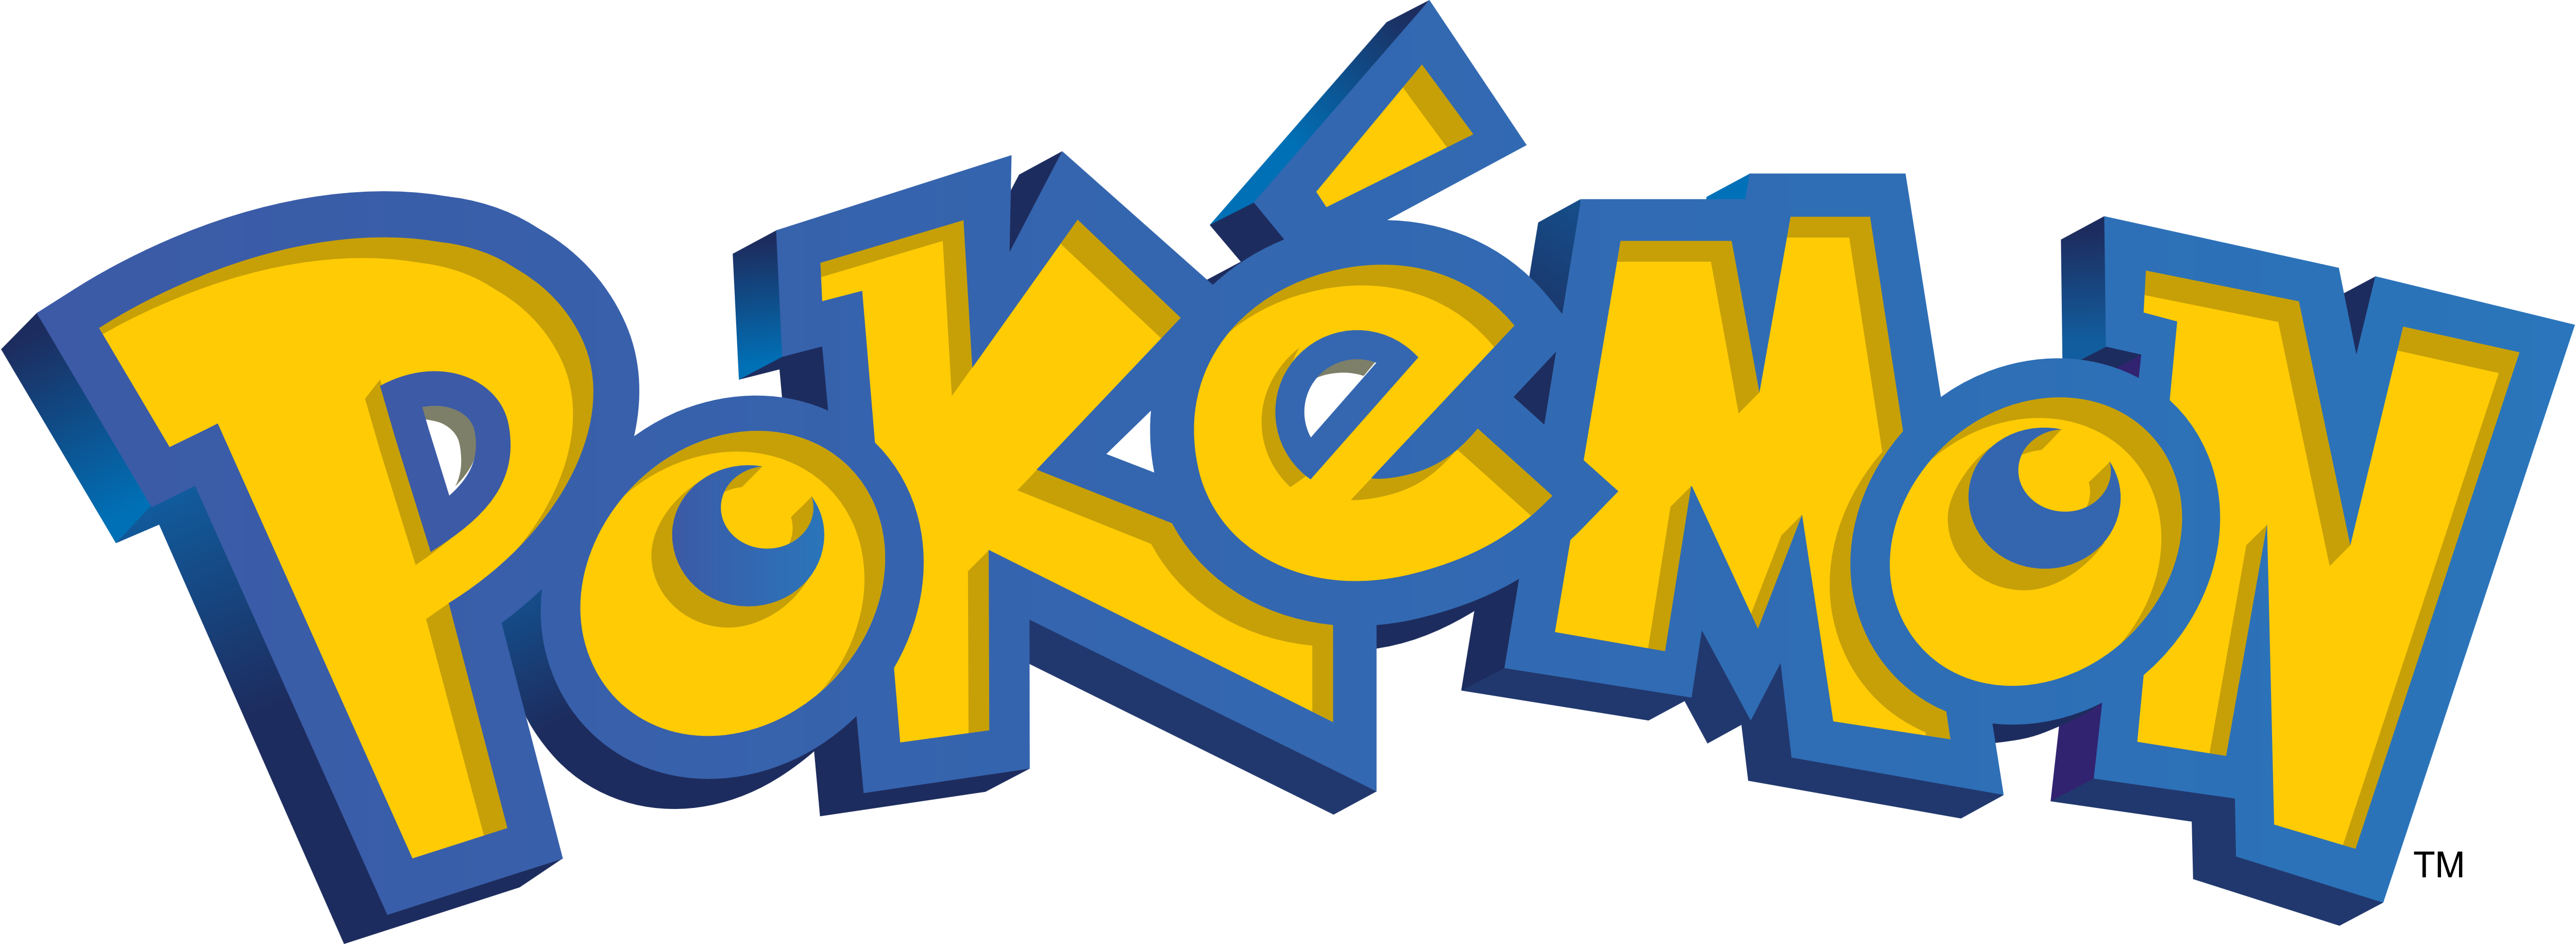 Pokemon Go Logo PNG - 106216